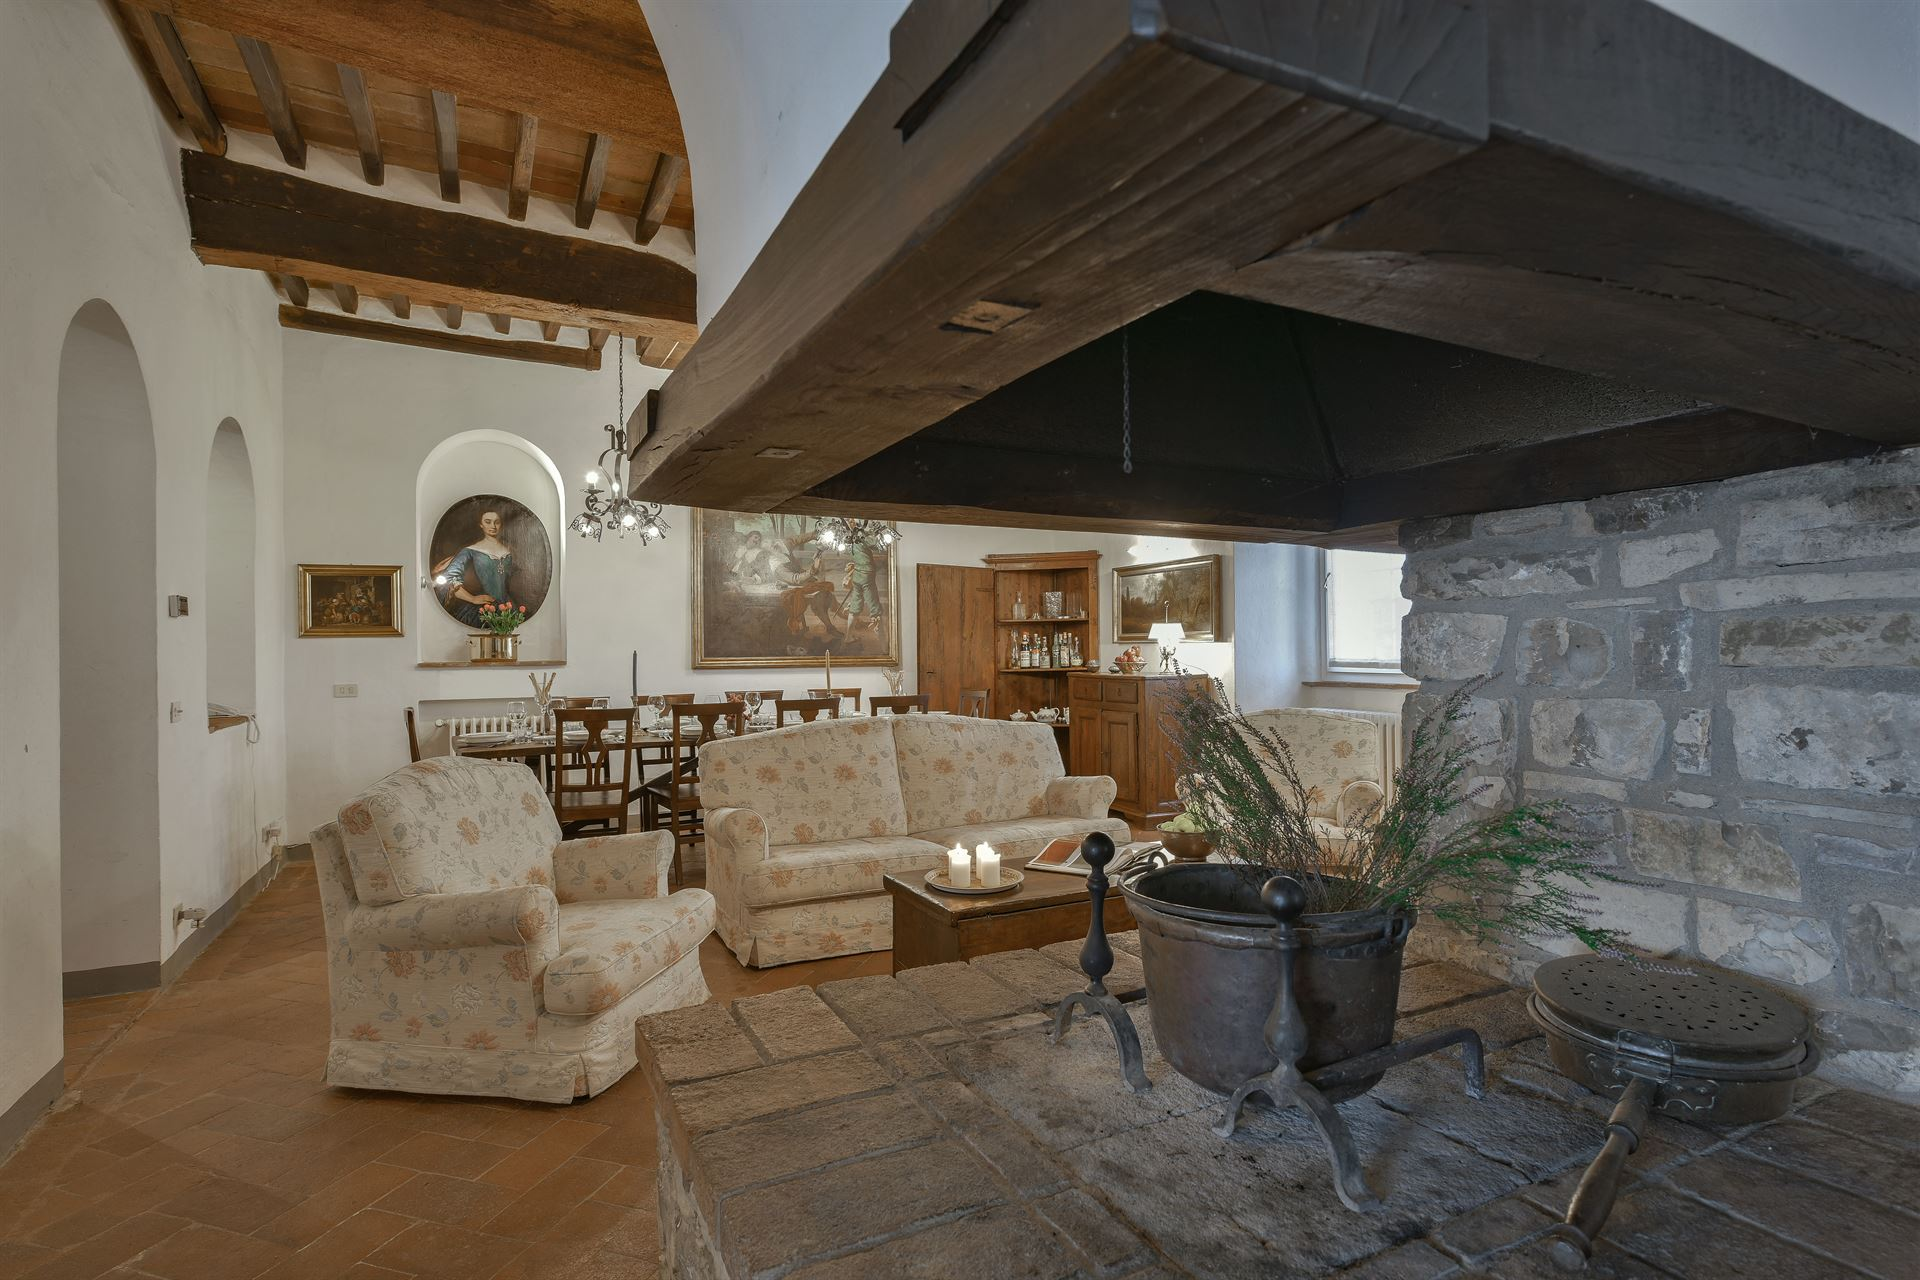 Penny Tiles Badkamer : Tuscany villa casale la canonica rental in pietrafitta